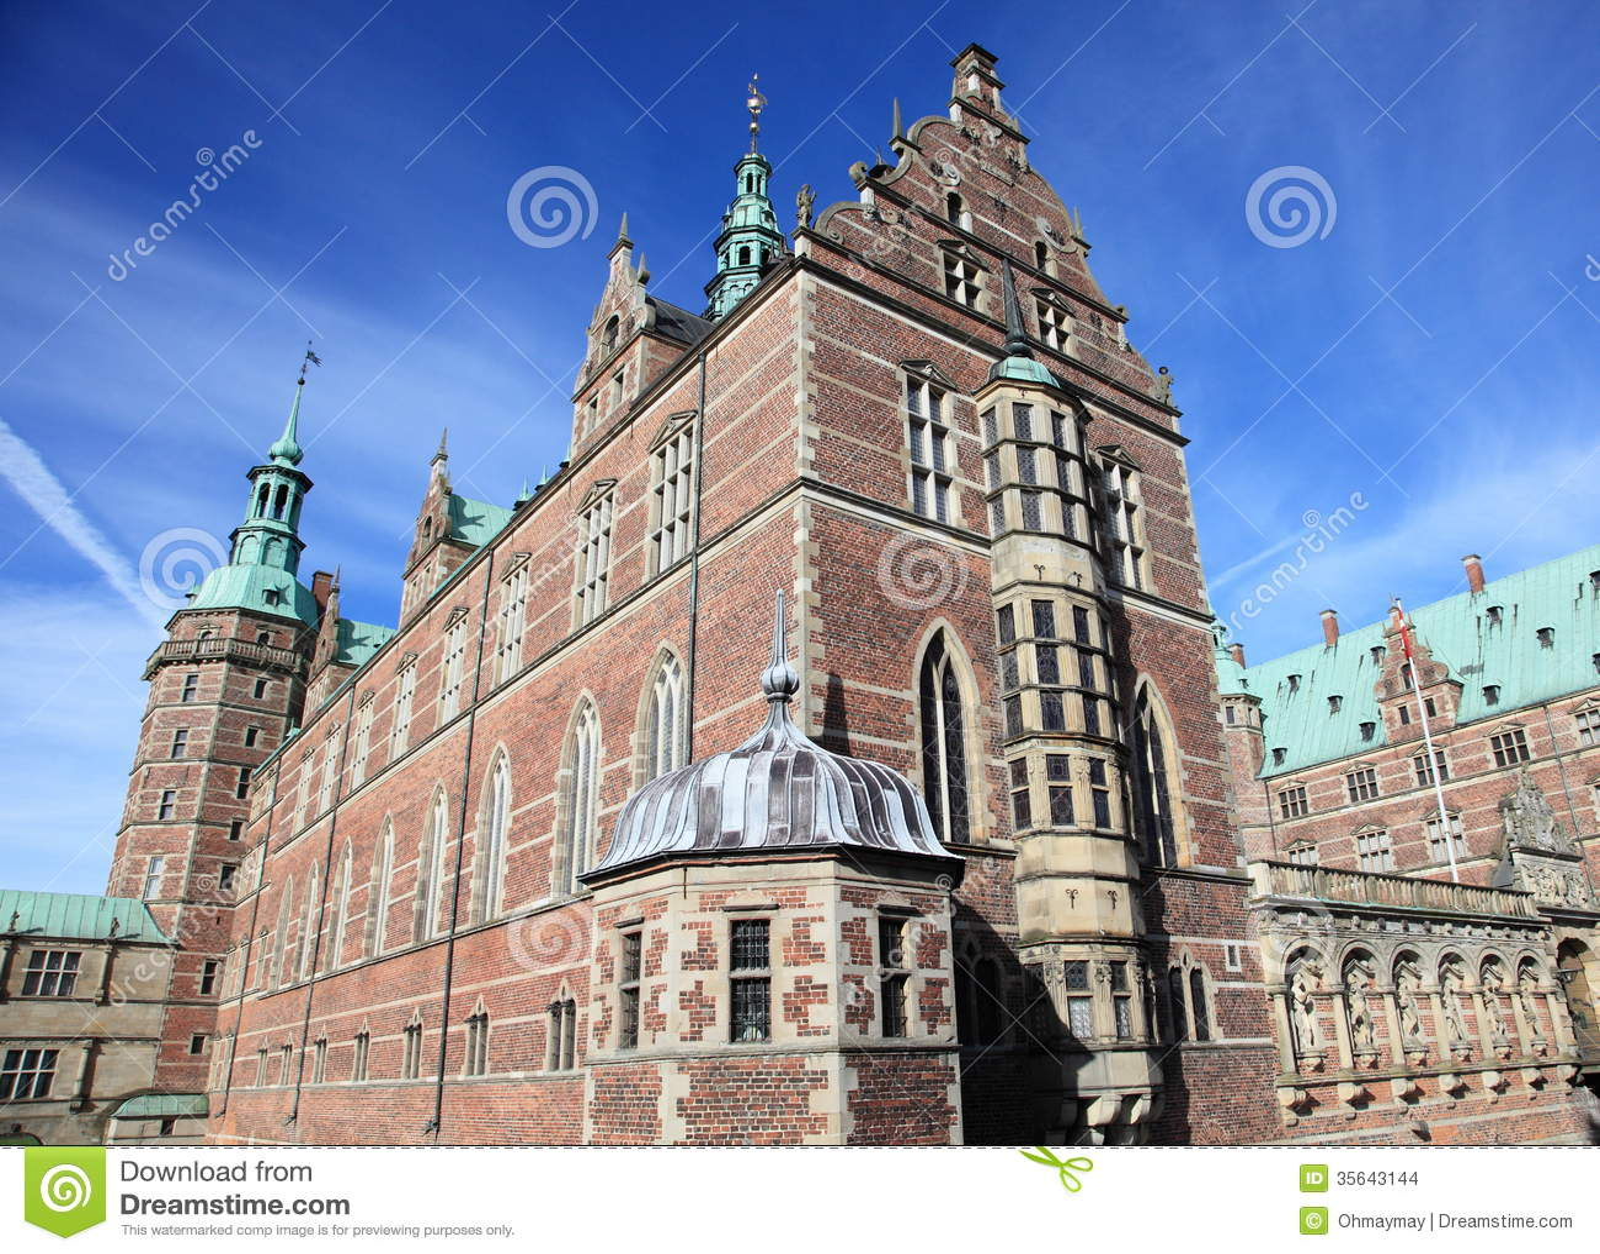 Château ingénieux au Danemark